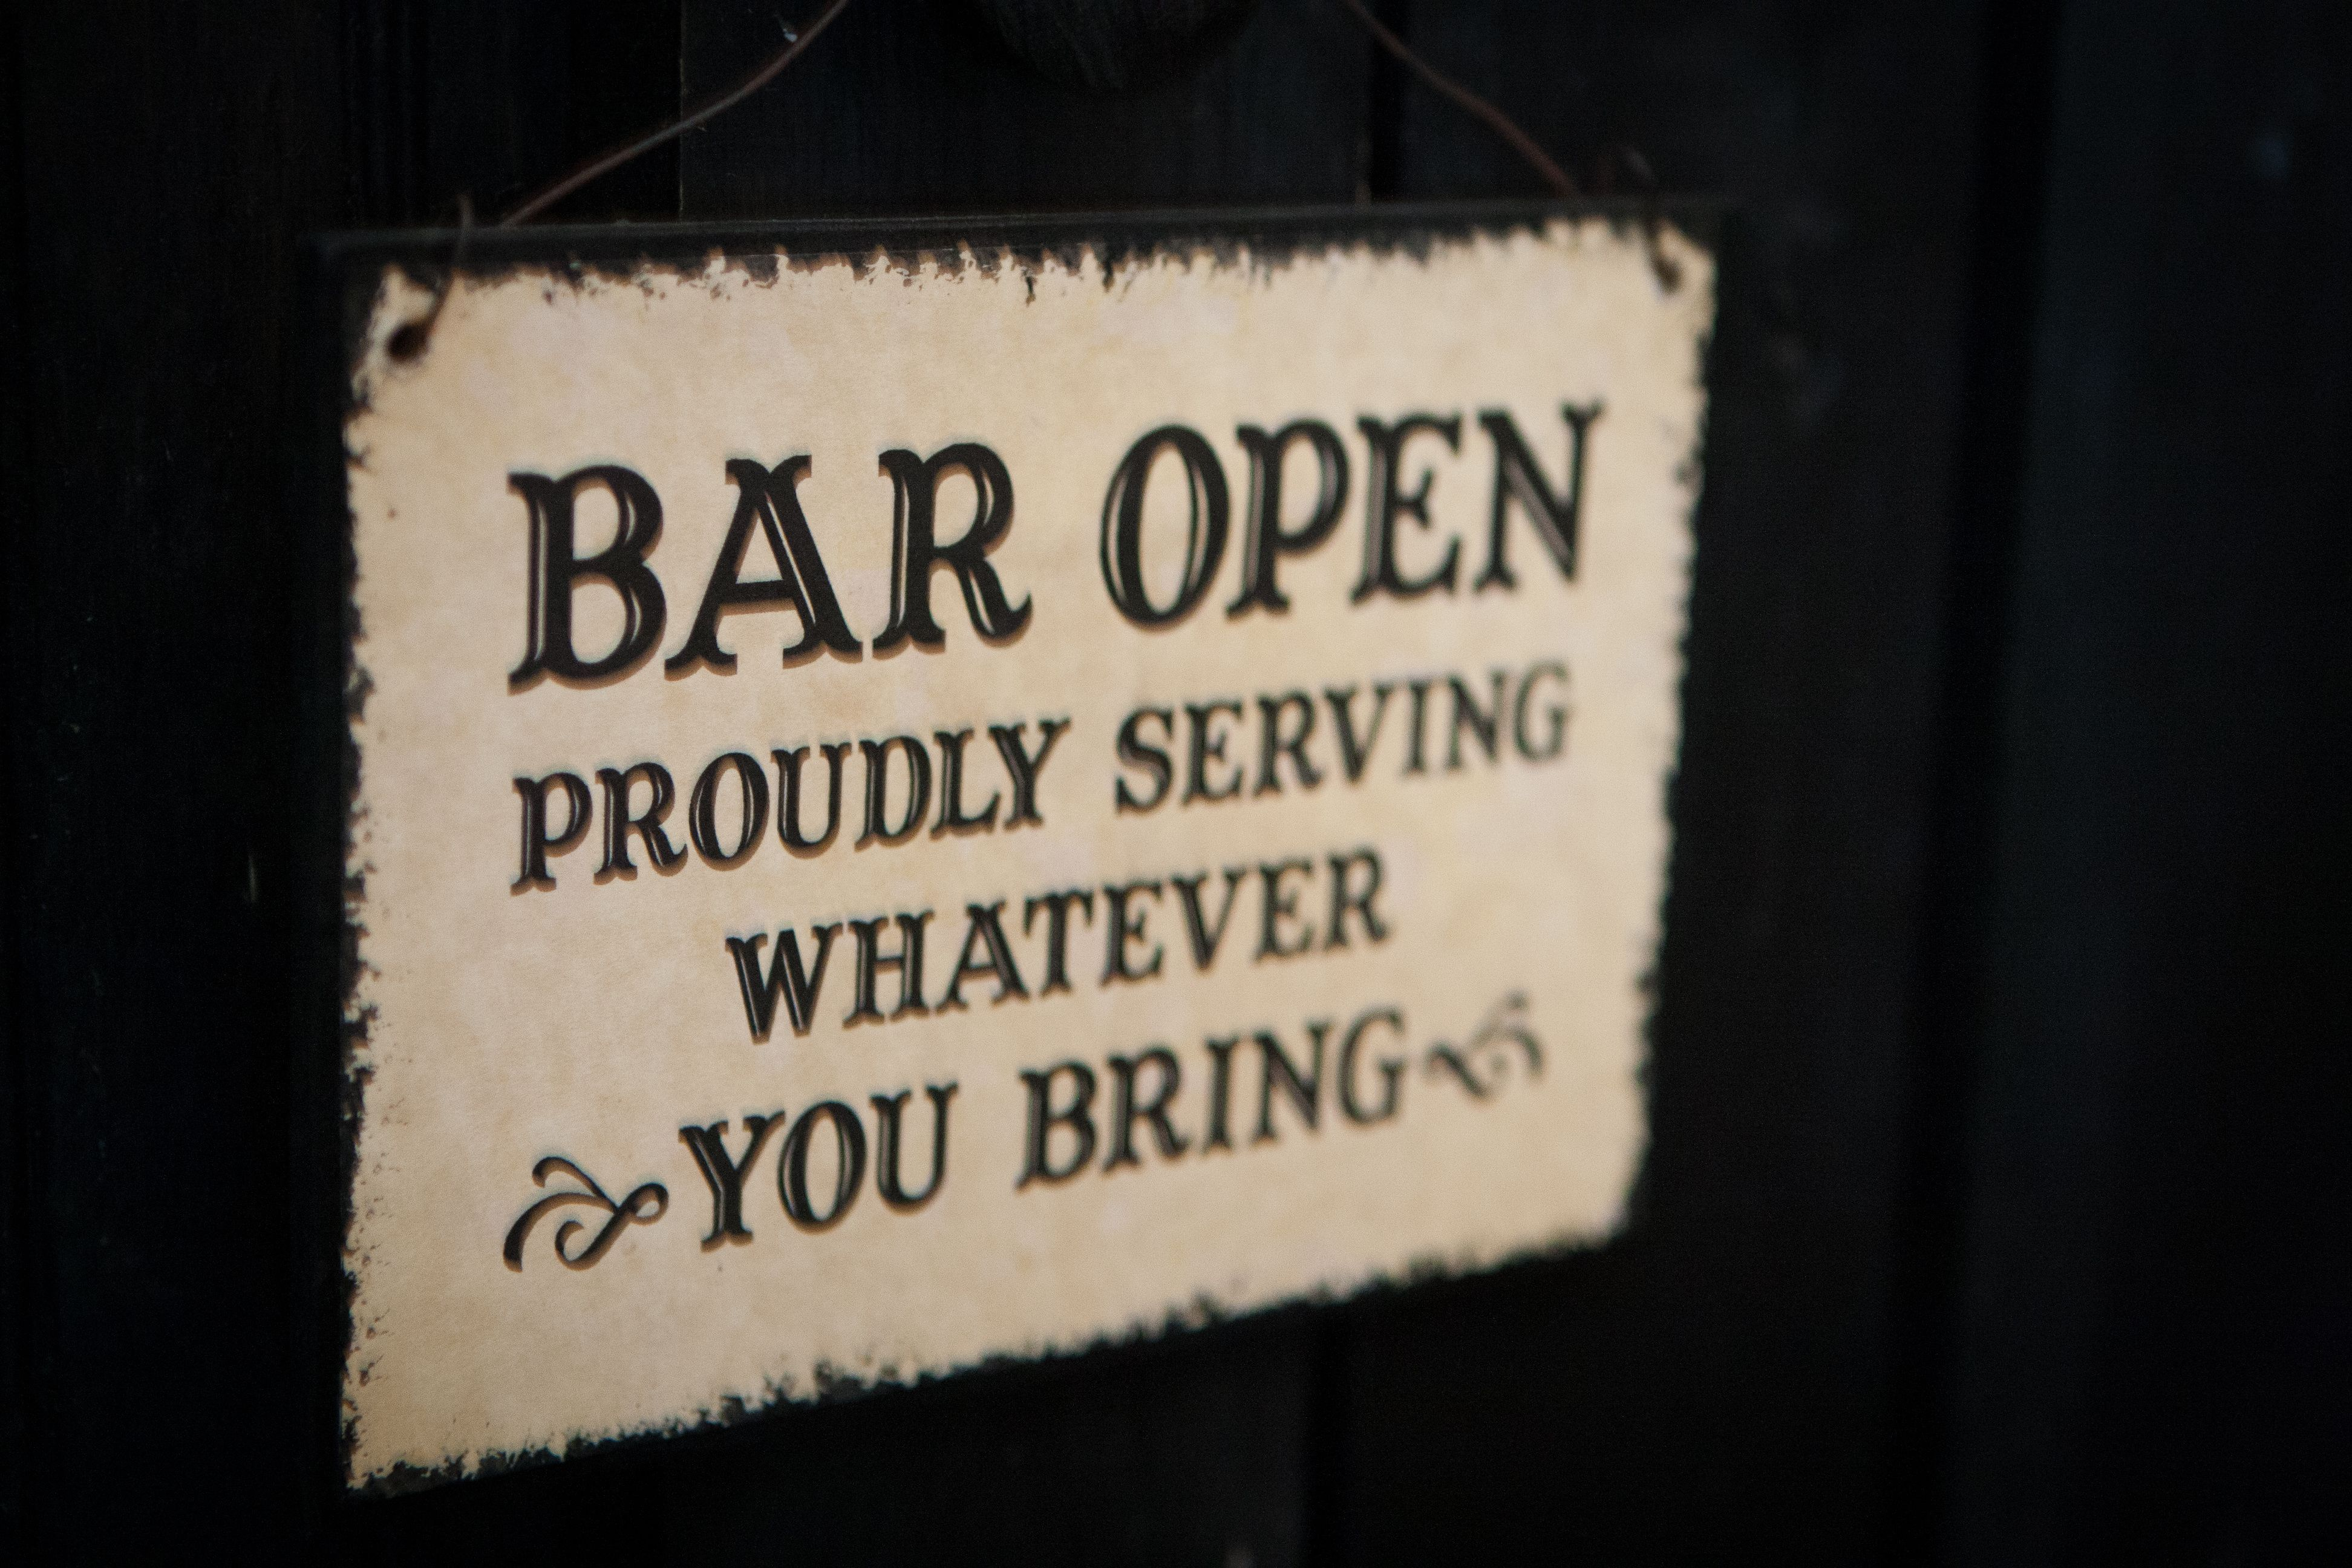 Cute Byob Sign For Your Backyard Wedding Bar Signs Pool Signs Backyard Bar